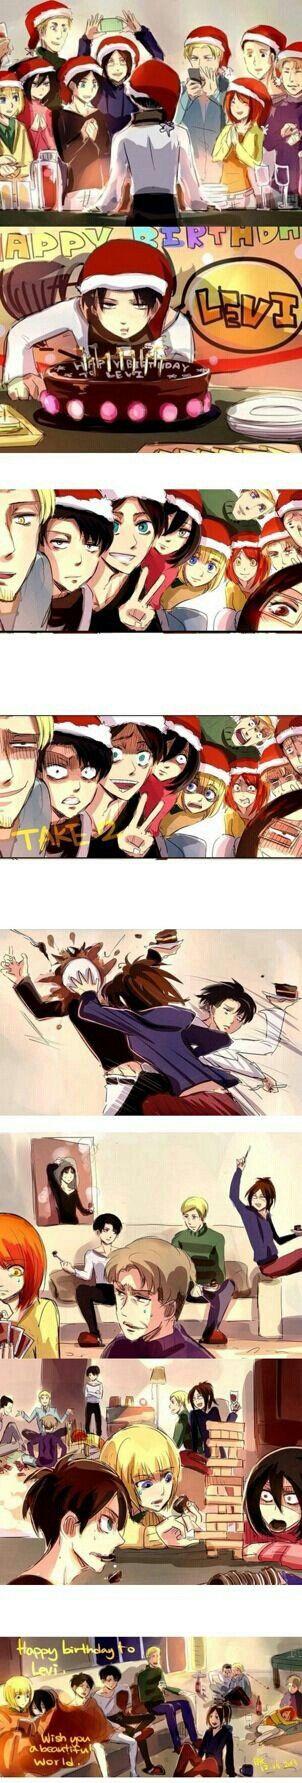 Happy birthday Levi! Attack on titan anime, Attack on